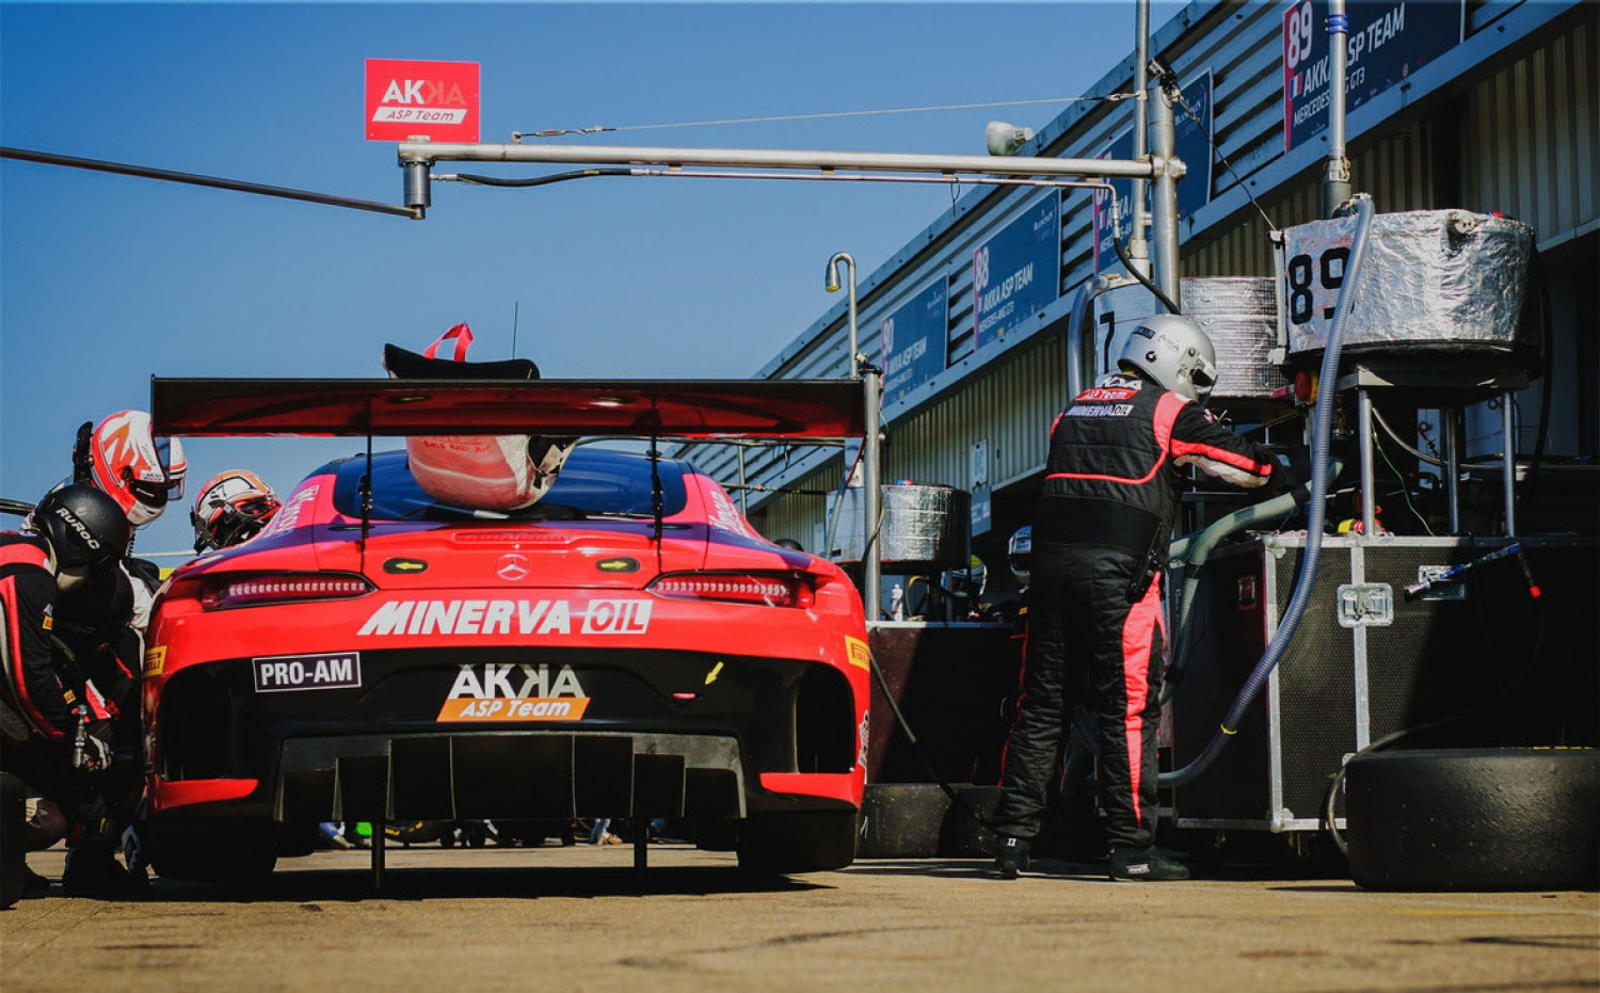 AKKA ASP Team reveals new Pro-Am line-up for full-season